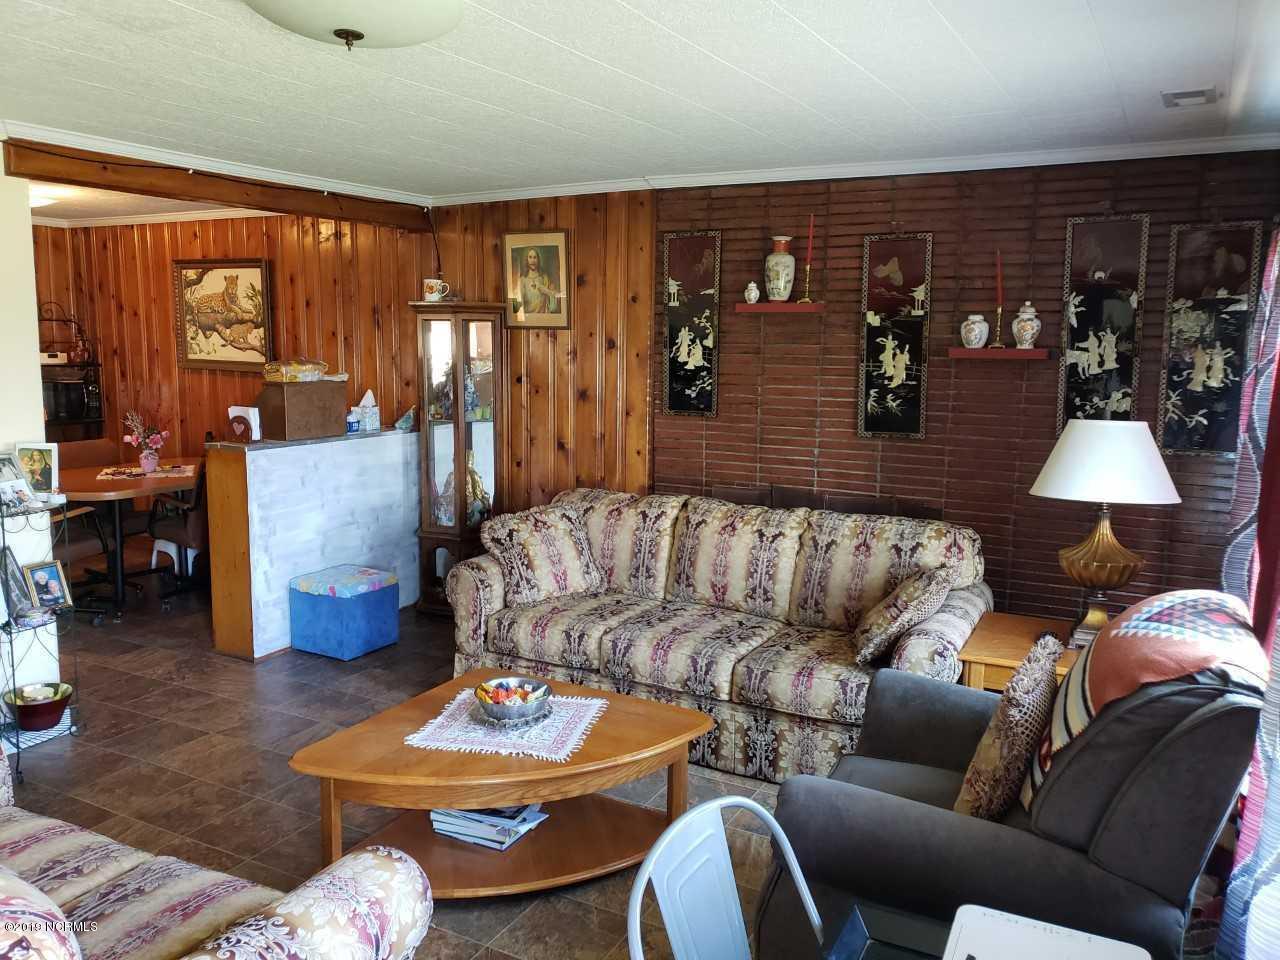 153 Johnson Point Road, New Bern, North Carolina, 3 Bedrooms Bedrooms, 5 Rooms Rooms,1 BathroomBathrooms,Single family residence,For sale,Johnson Point,100154637